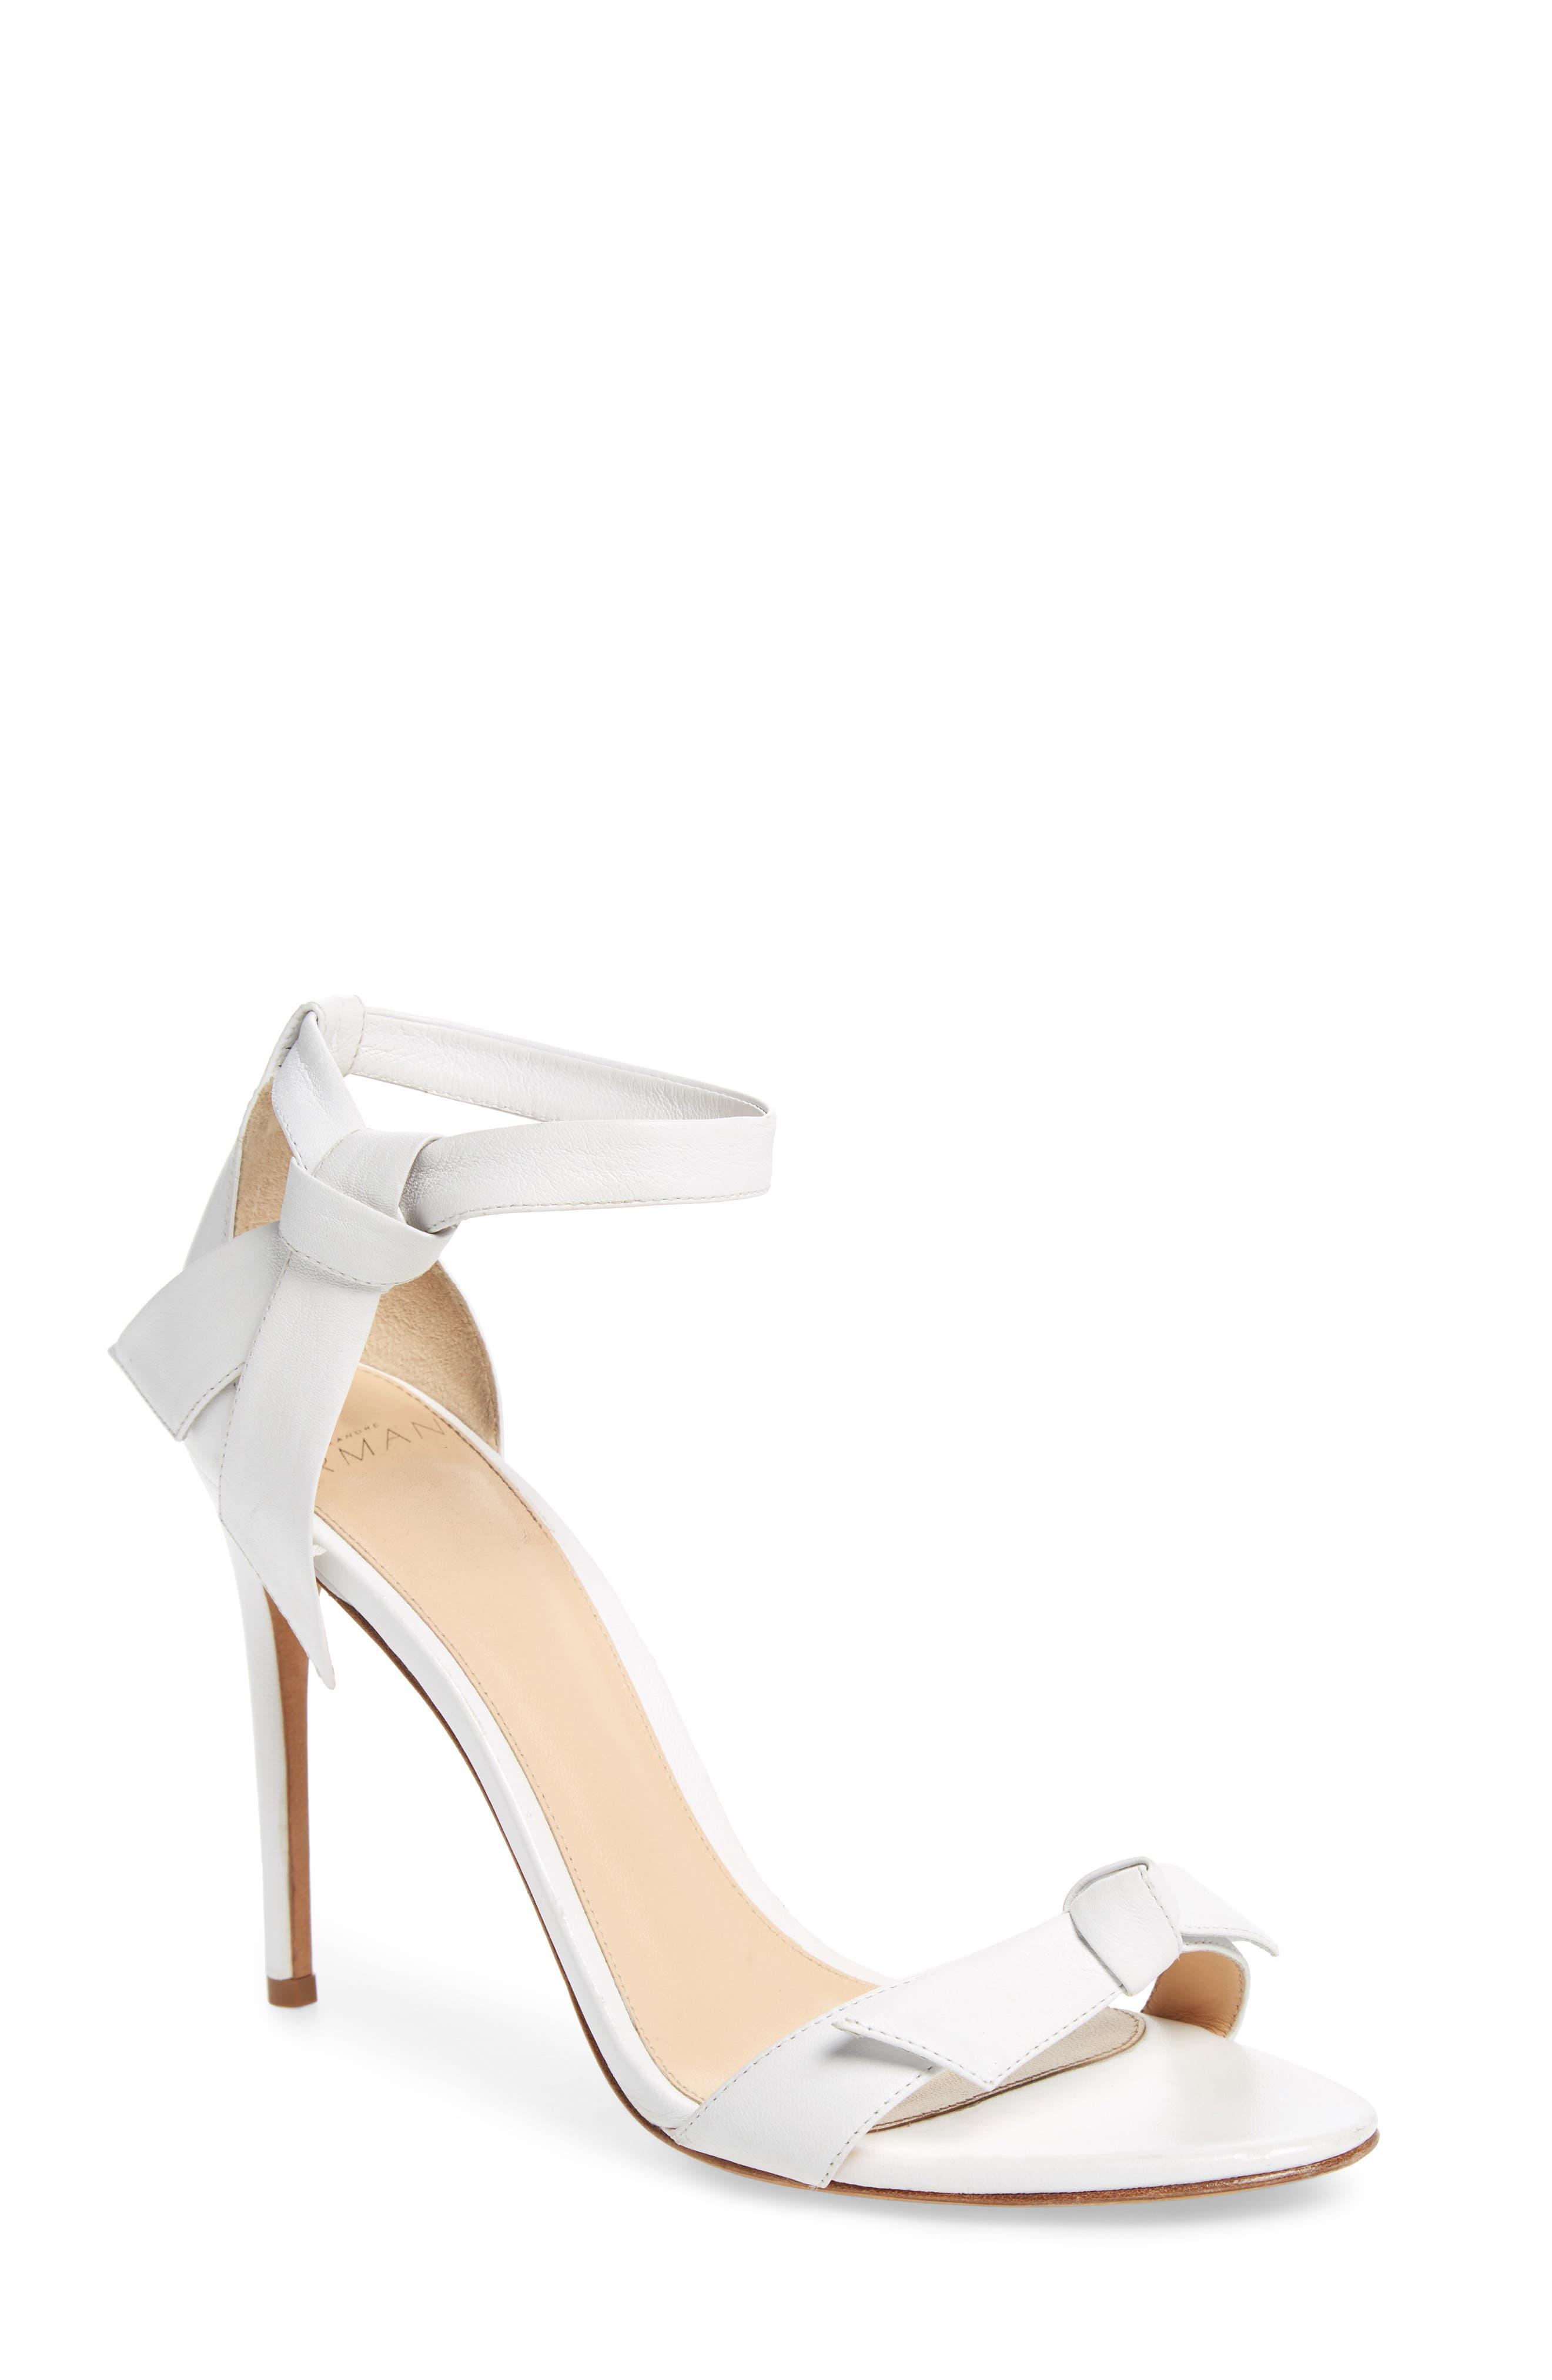 Alternate Image 1 Selected - Alexandre Birman 'Clarita' Ankle Tie Sandal (Women)